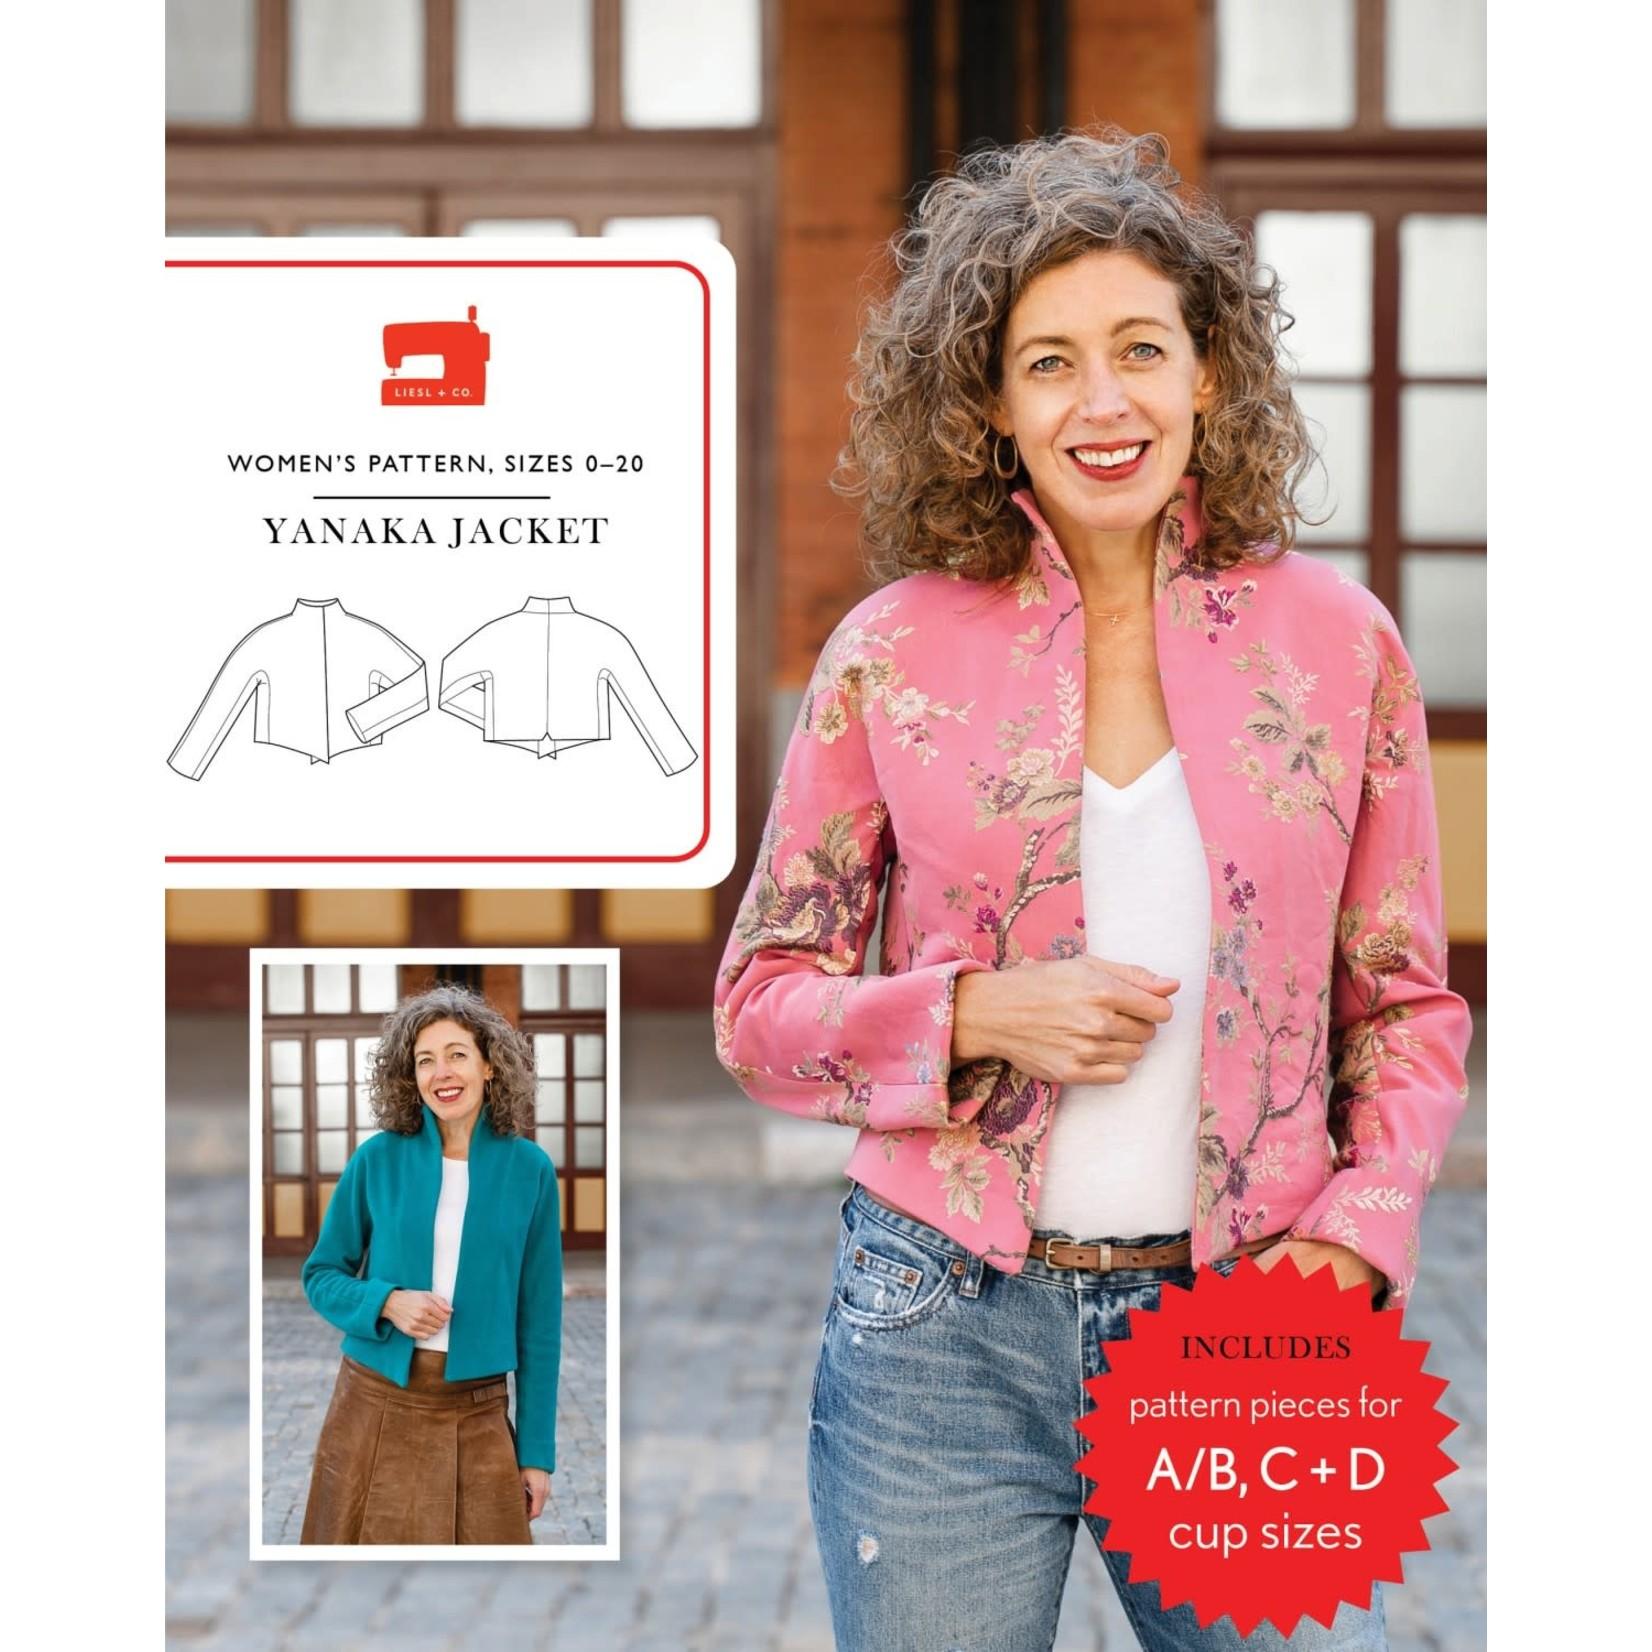 Liesel + Co Yanaka Jacket (Sizes 0-20)